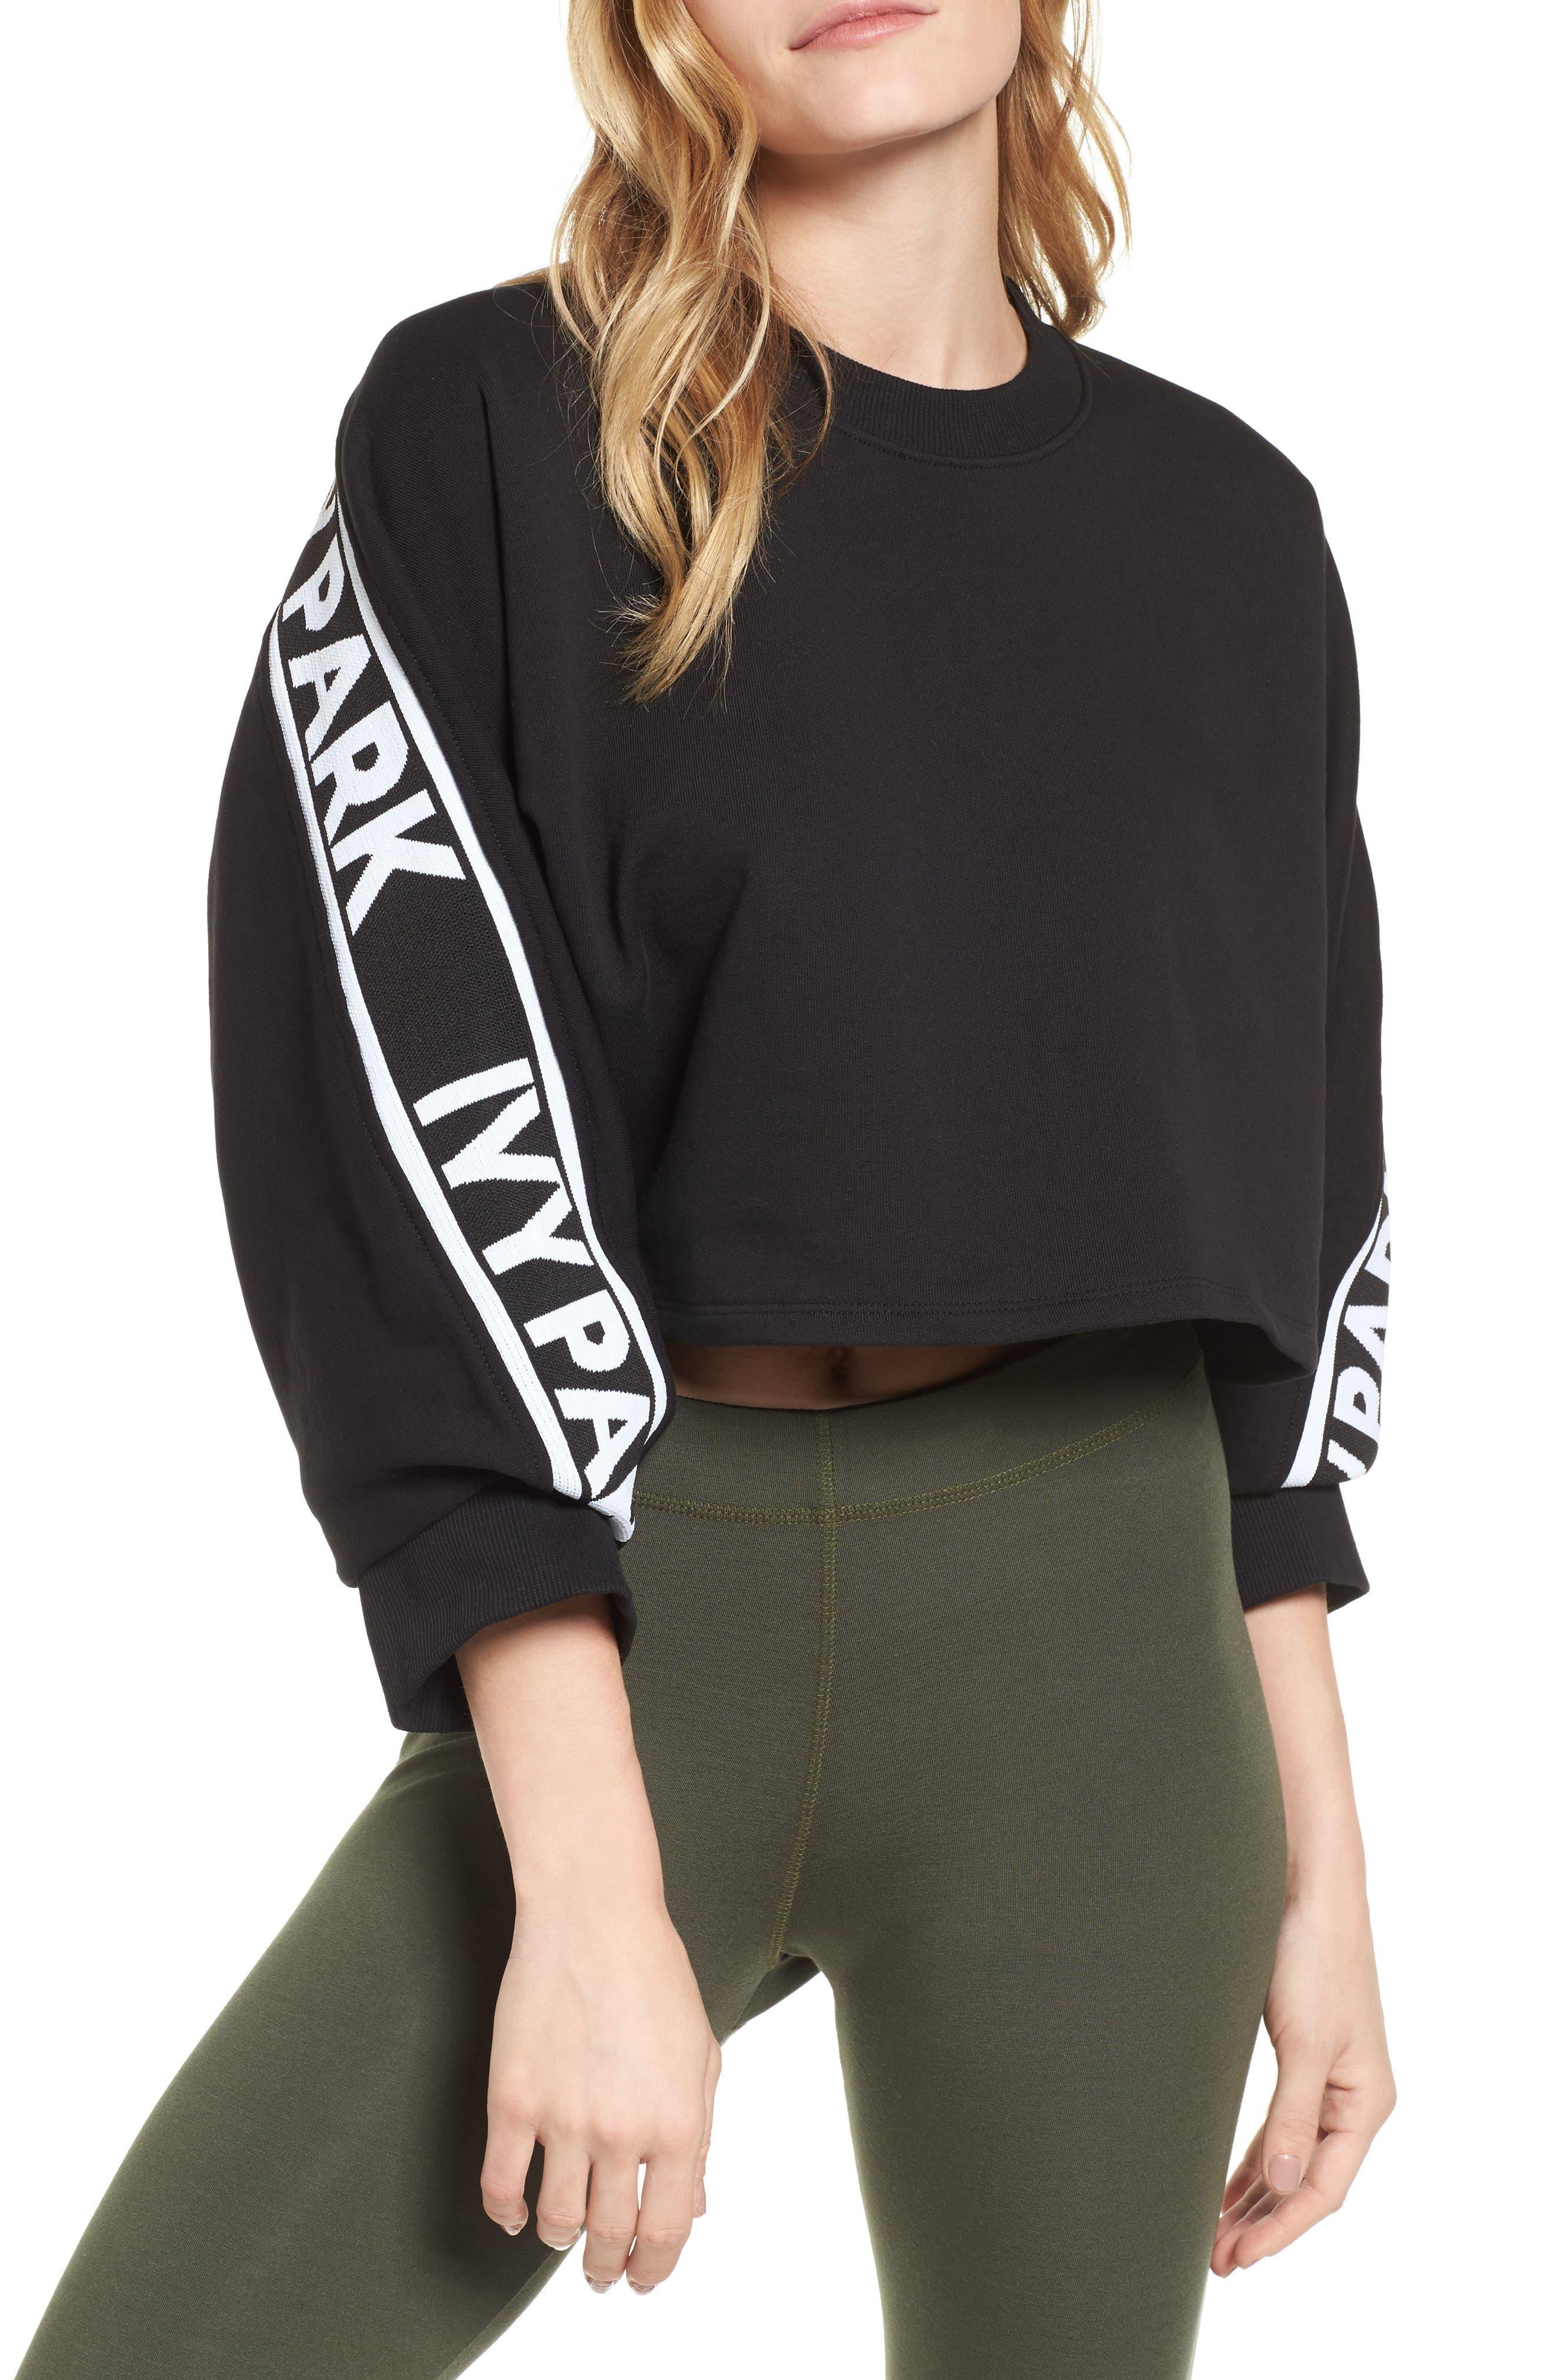 IVY PARK® Logo Tape Crop Sweatshirt